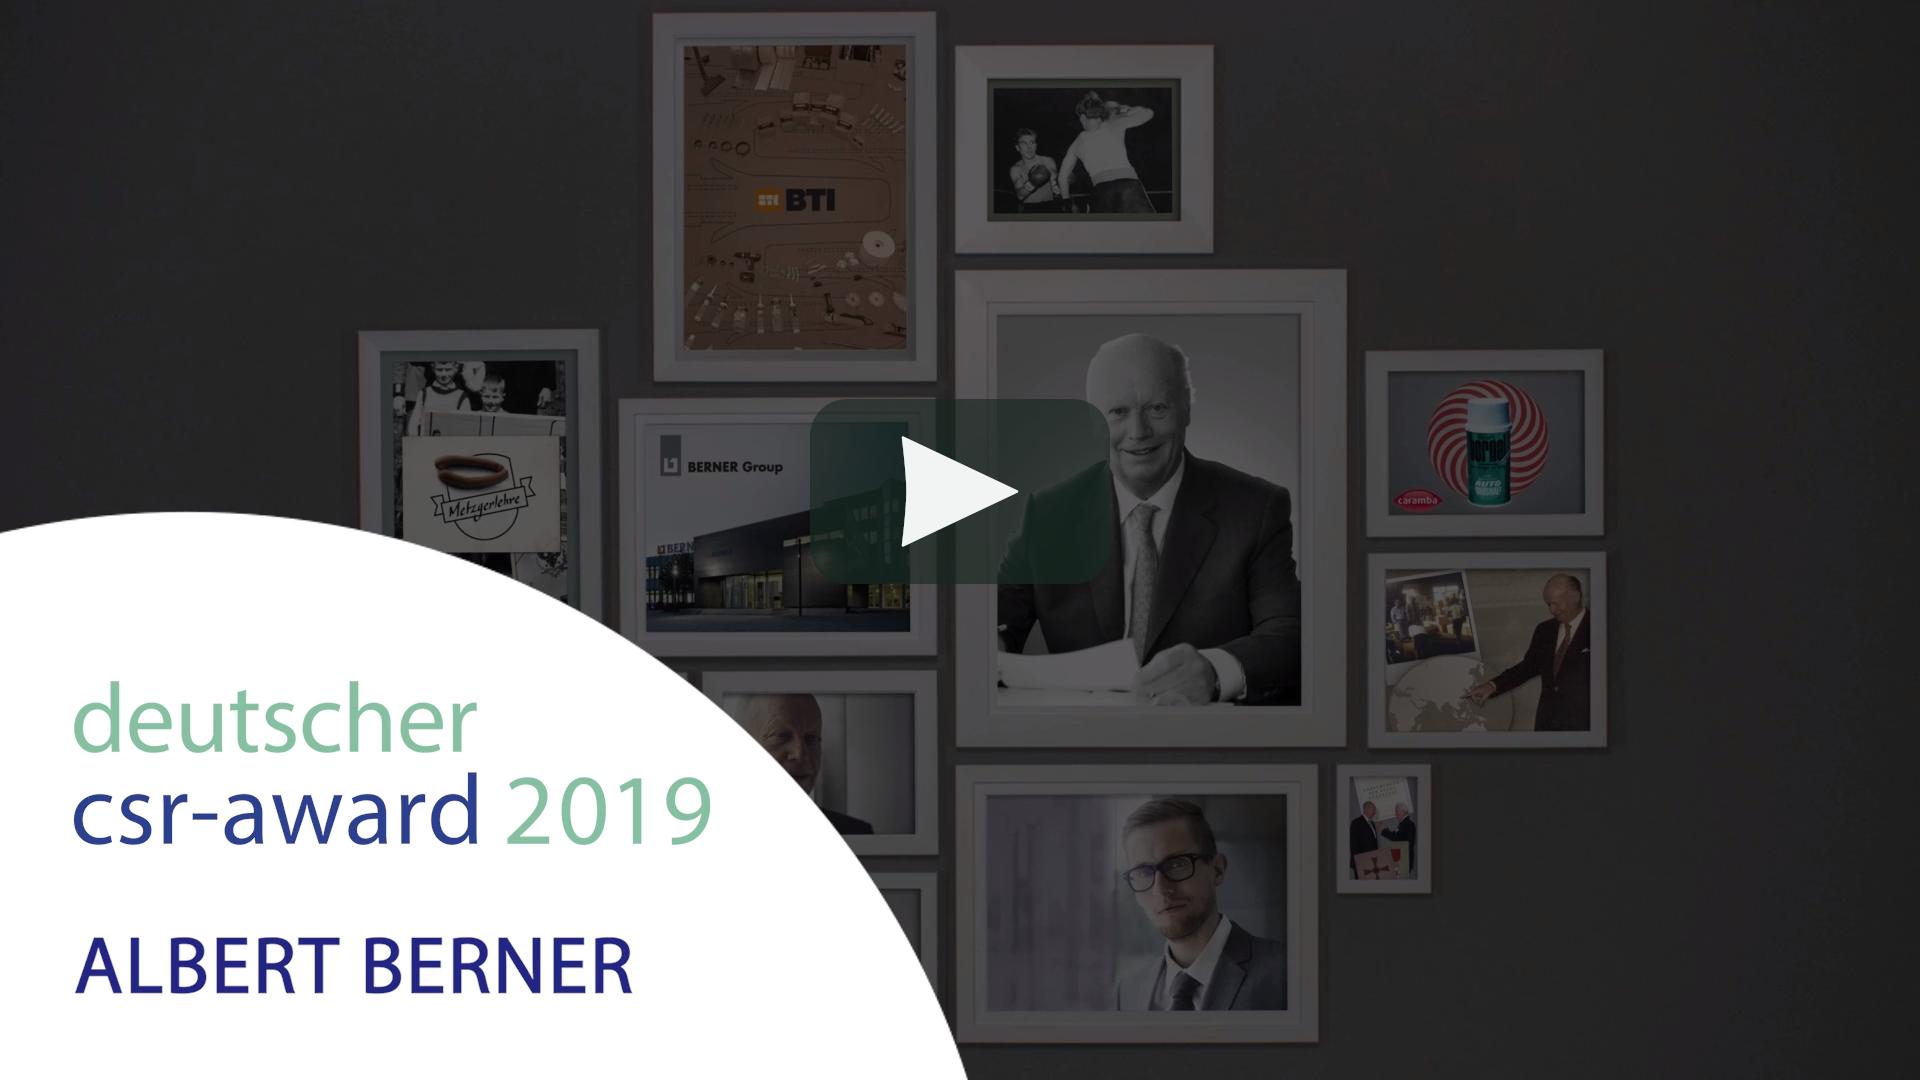 Video Vimeo: Deutscher CSR Preis 2019 - Albert Barner